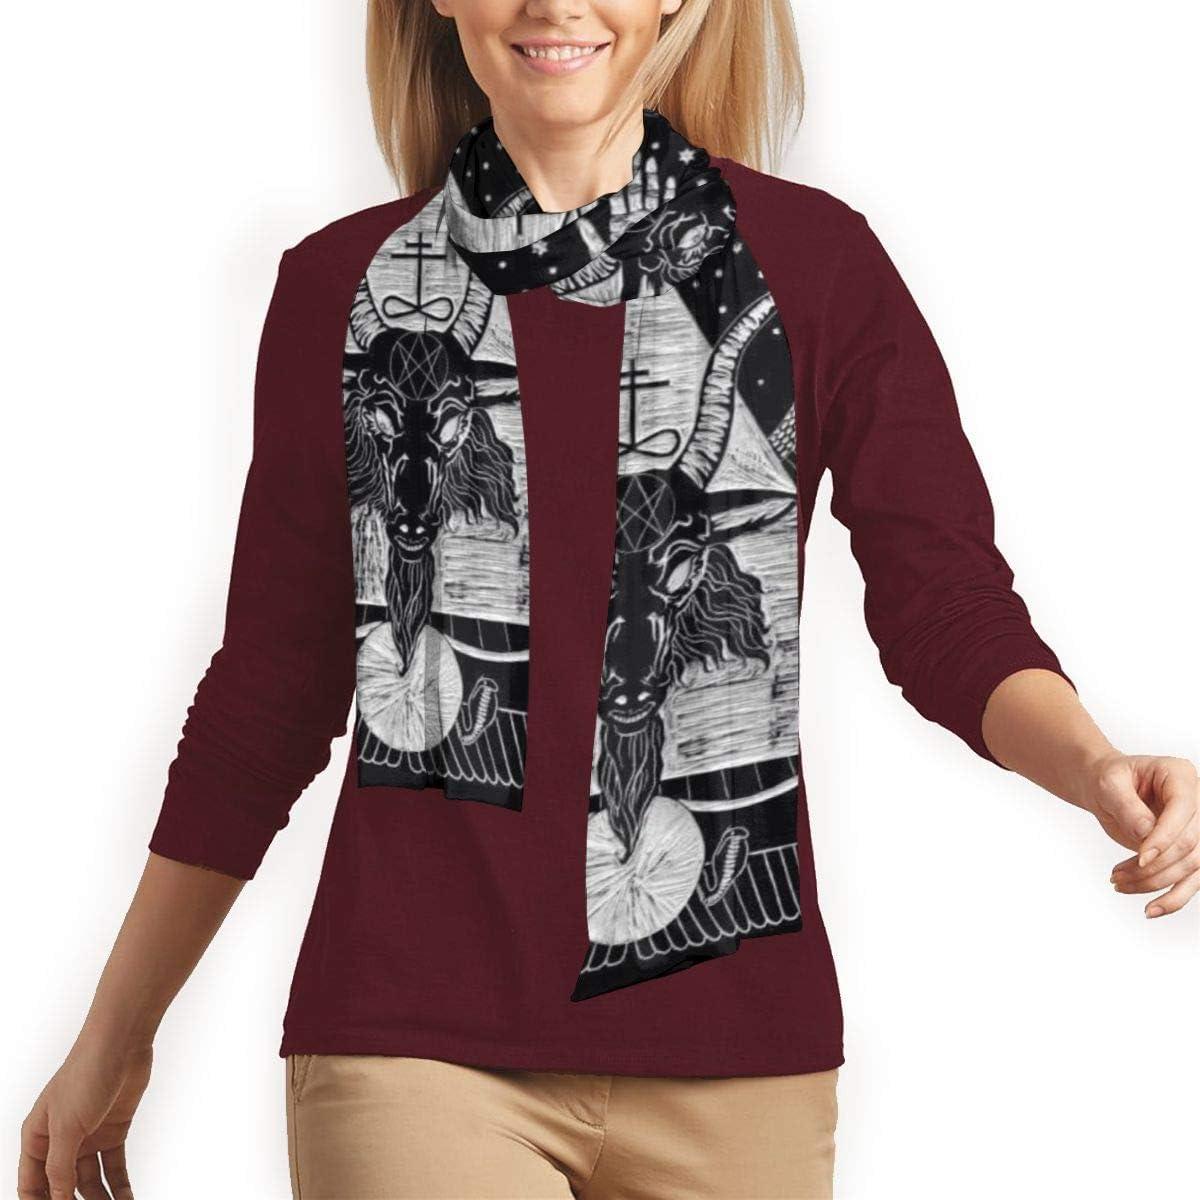 Pentagram Demon Satanic Goat Head Scarf For Men Women Lightweight Fashion Long Luxurious Scarves Shawl Wrap Unisex